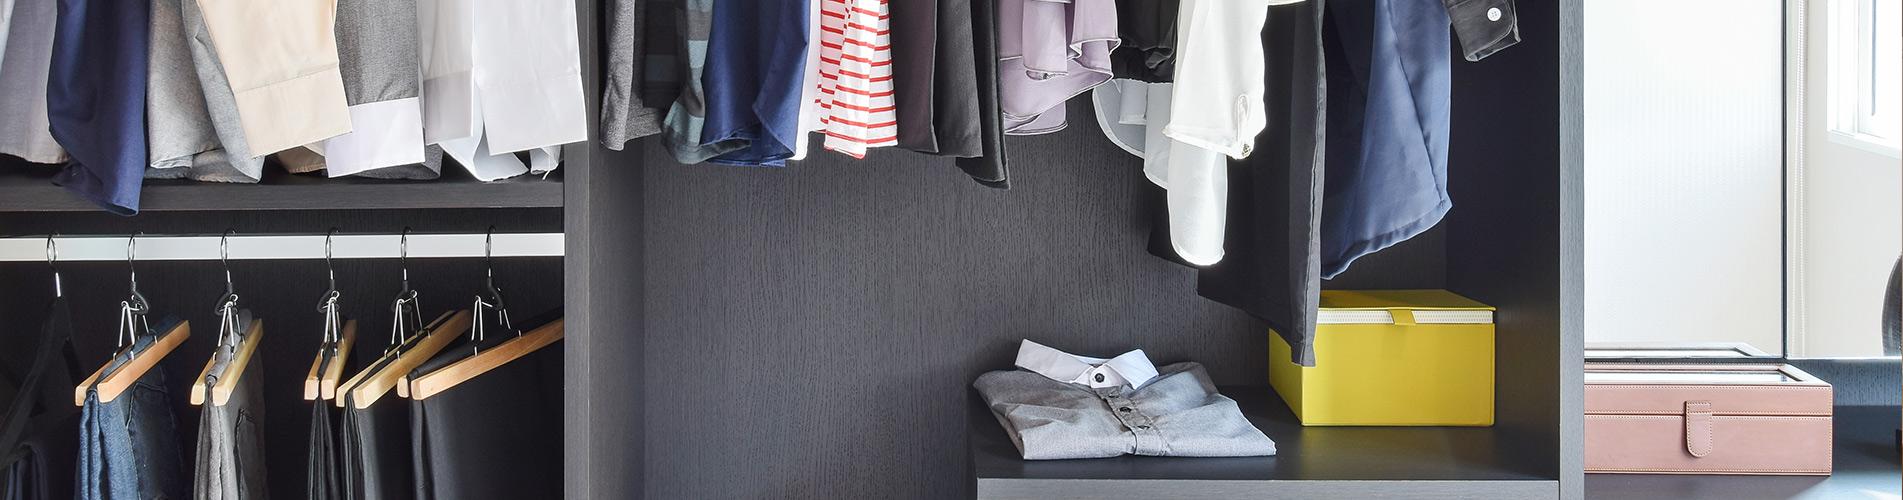 custom closets in midland mi closet design service